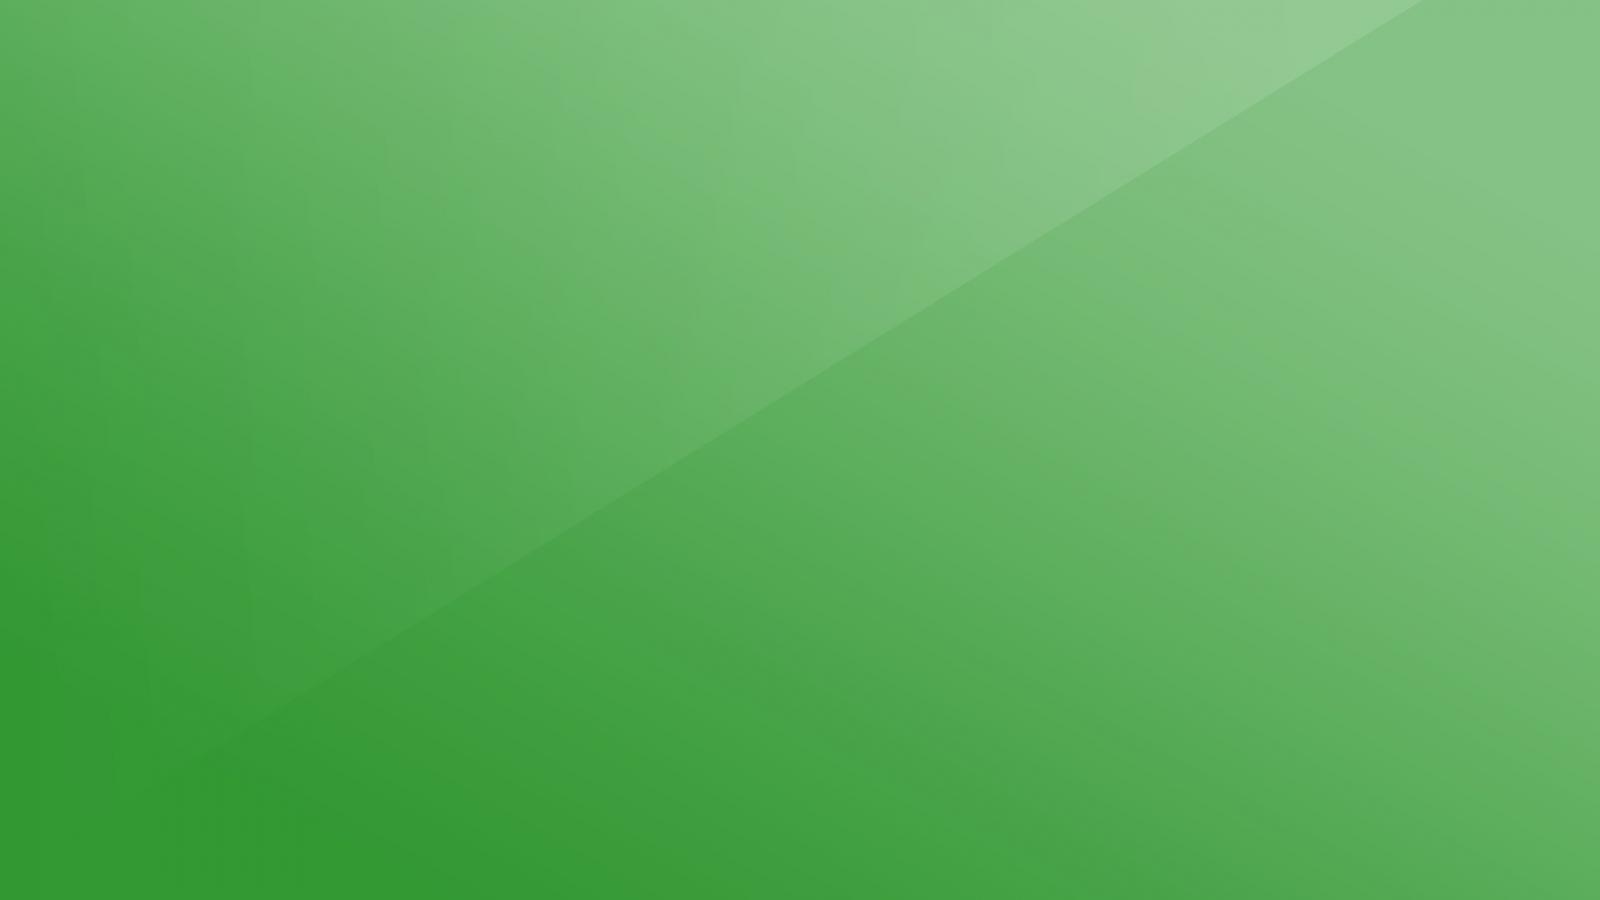 Fondo verde - 1600x900